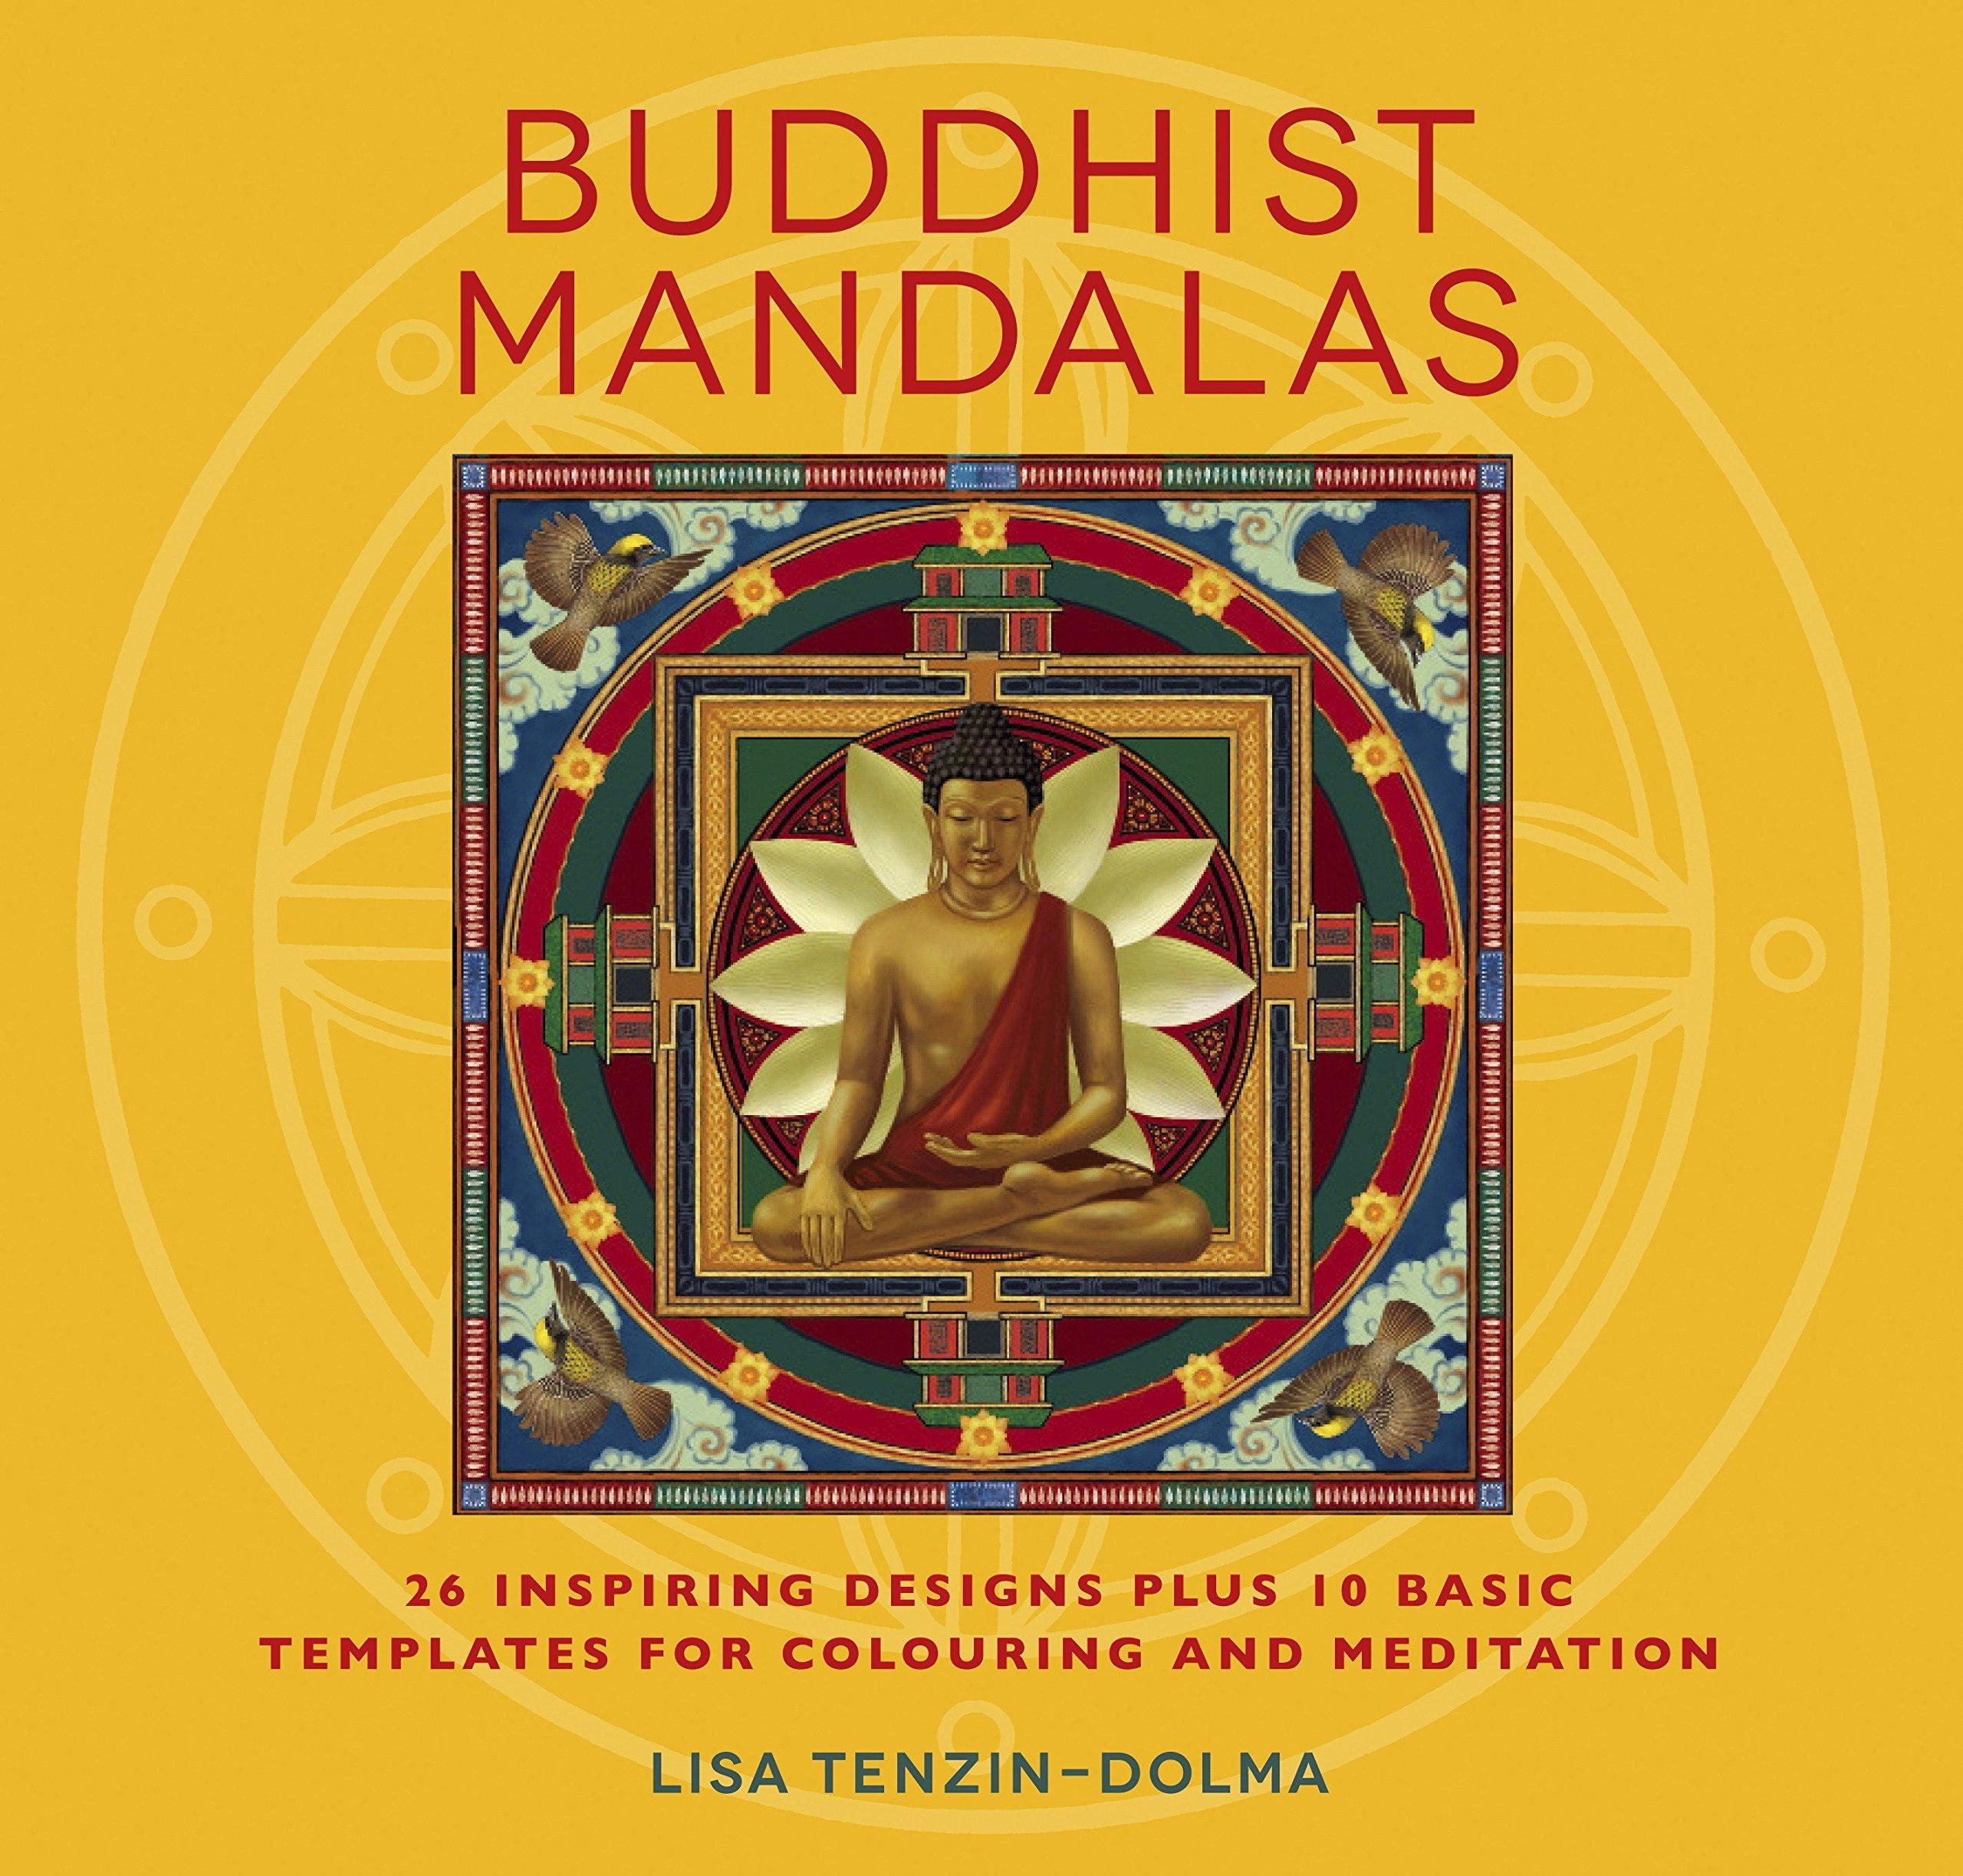 Amazon.com: Buddhist Mandalas: 26 Inspiring Designs for Colouring ...